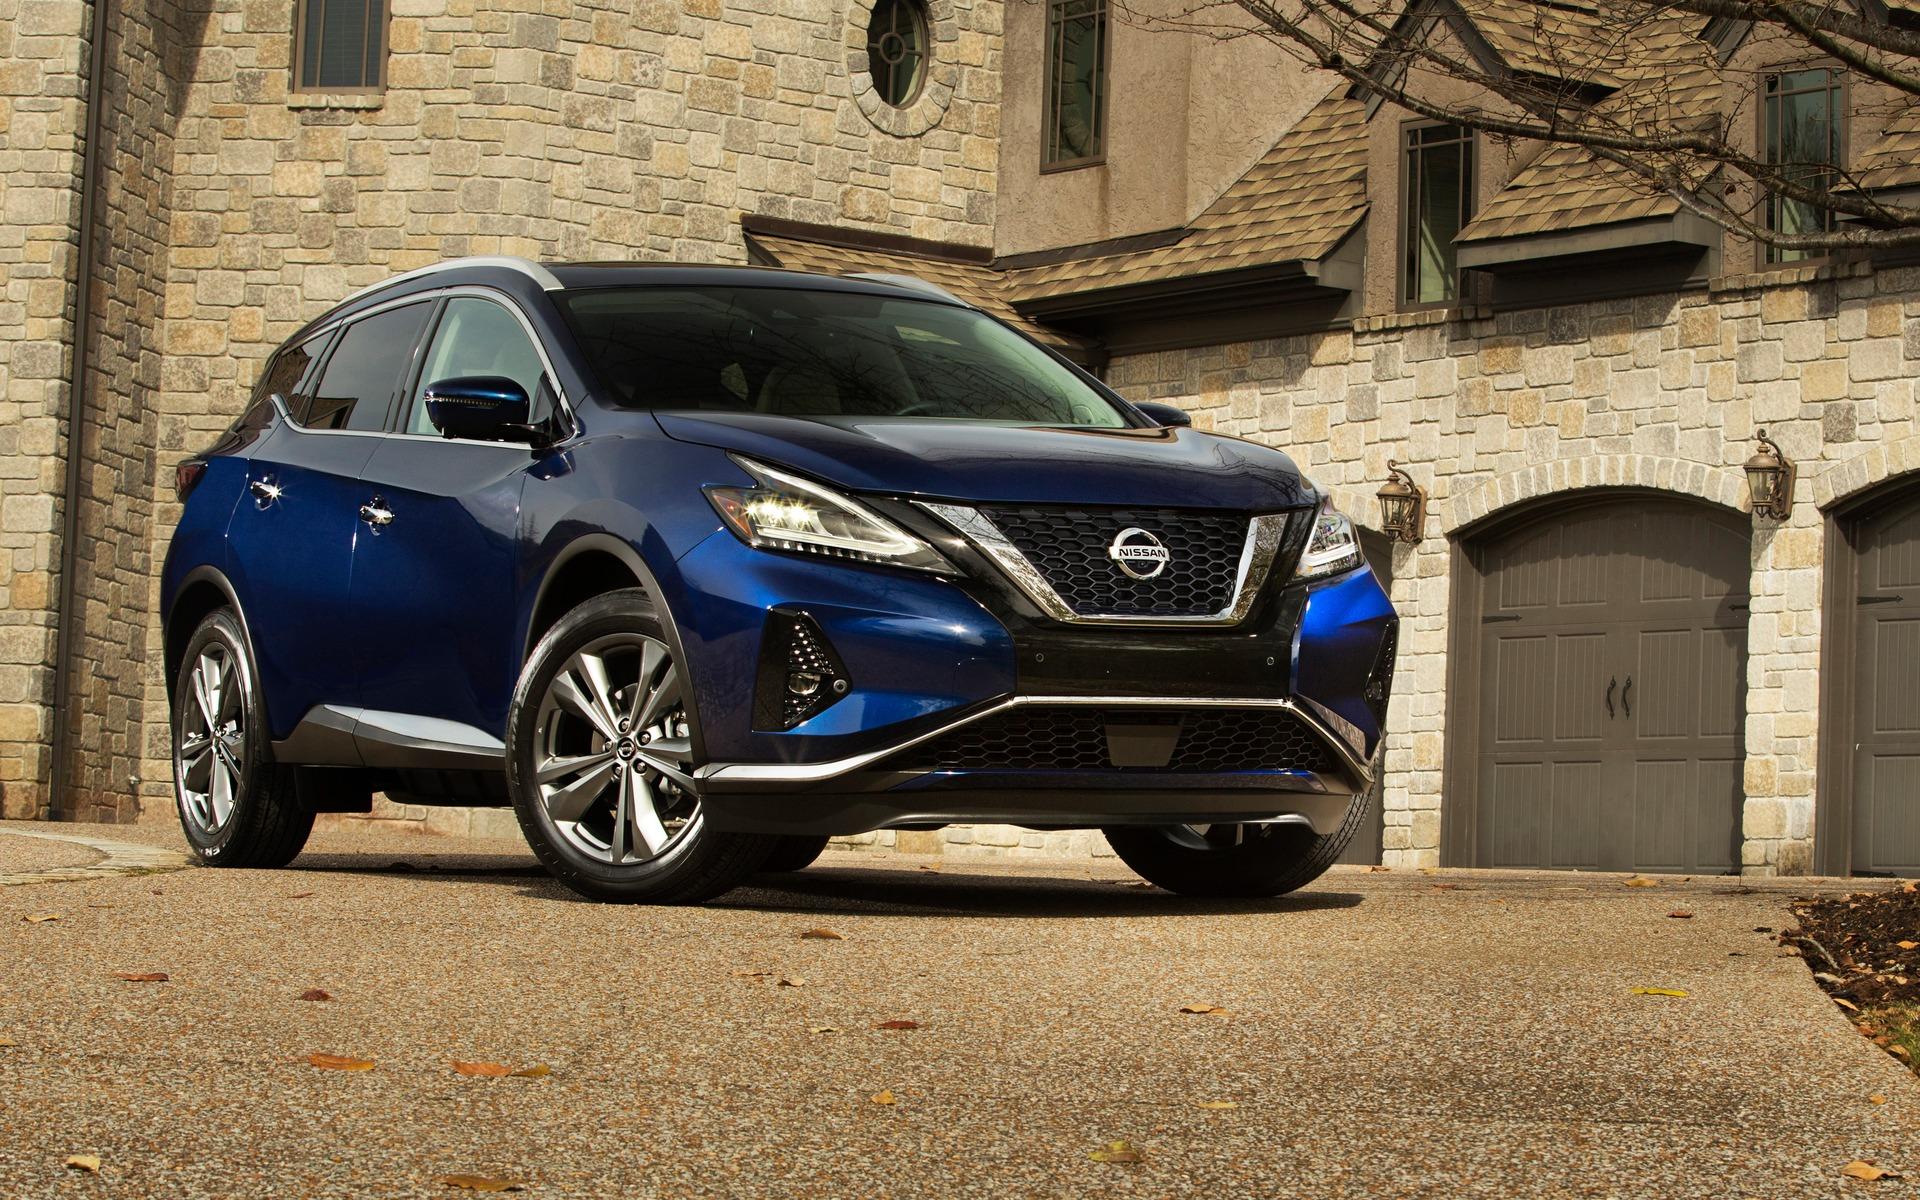 Nissan dévoile le Murano 2019 358012_Niisan_presnte_le_Murano_2019